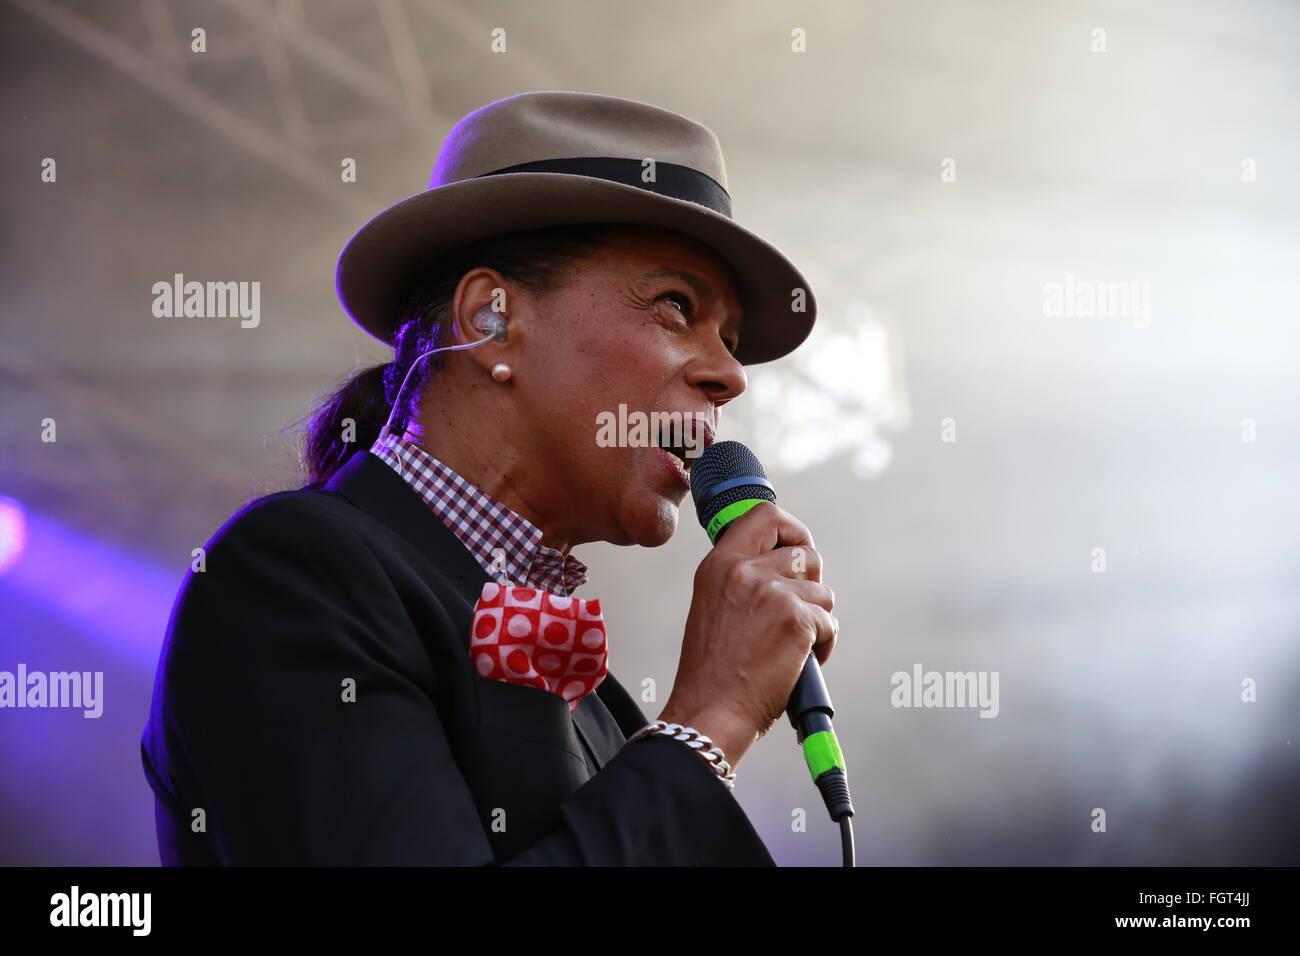 The Selecter, Village Green Music and Arts Festival, Southend-on-Sea, Essex © Clarissa Debenham / Alamy - Stock Image